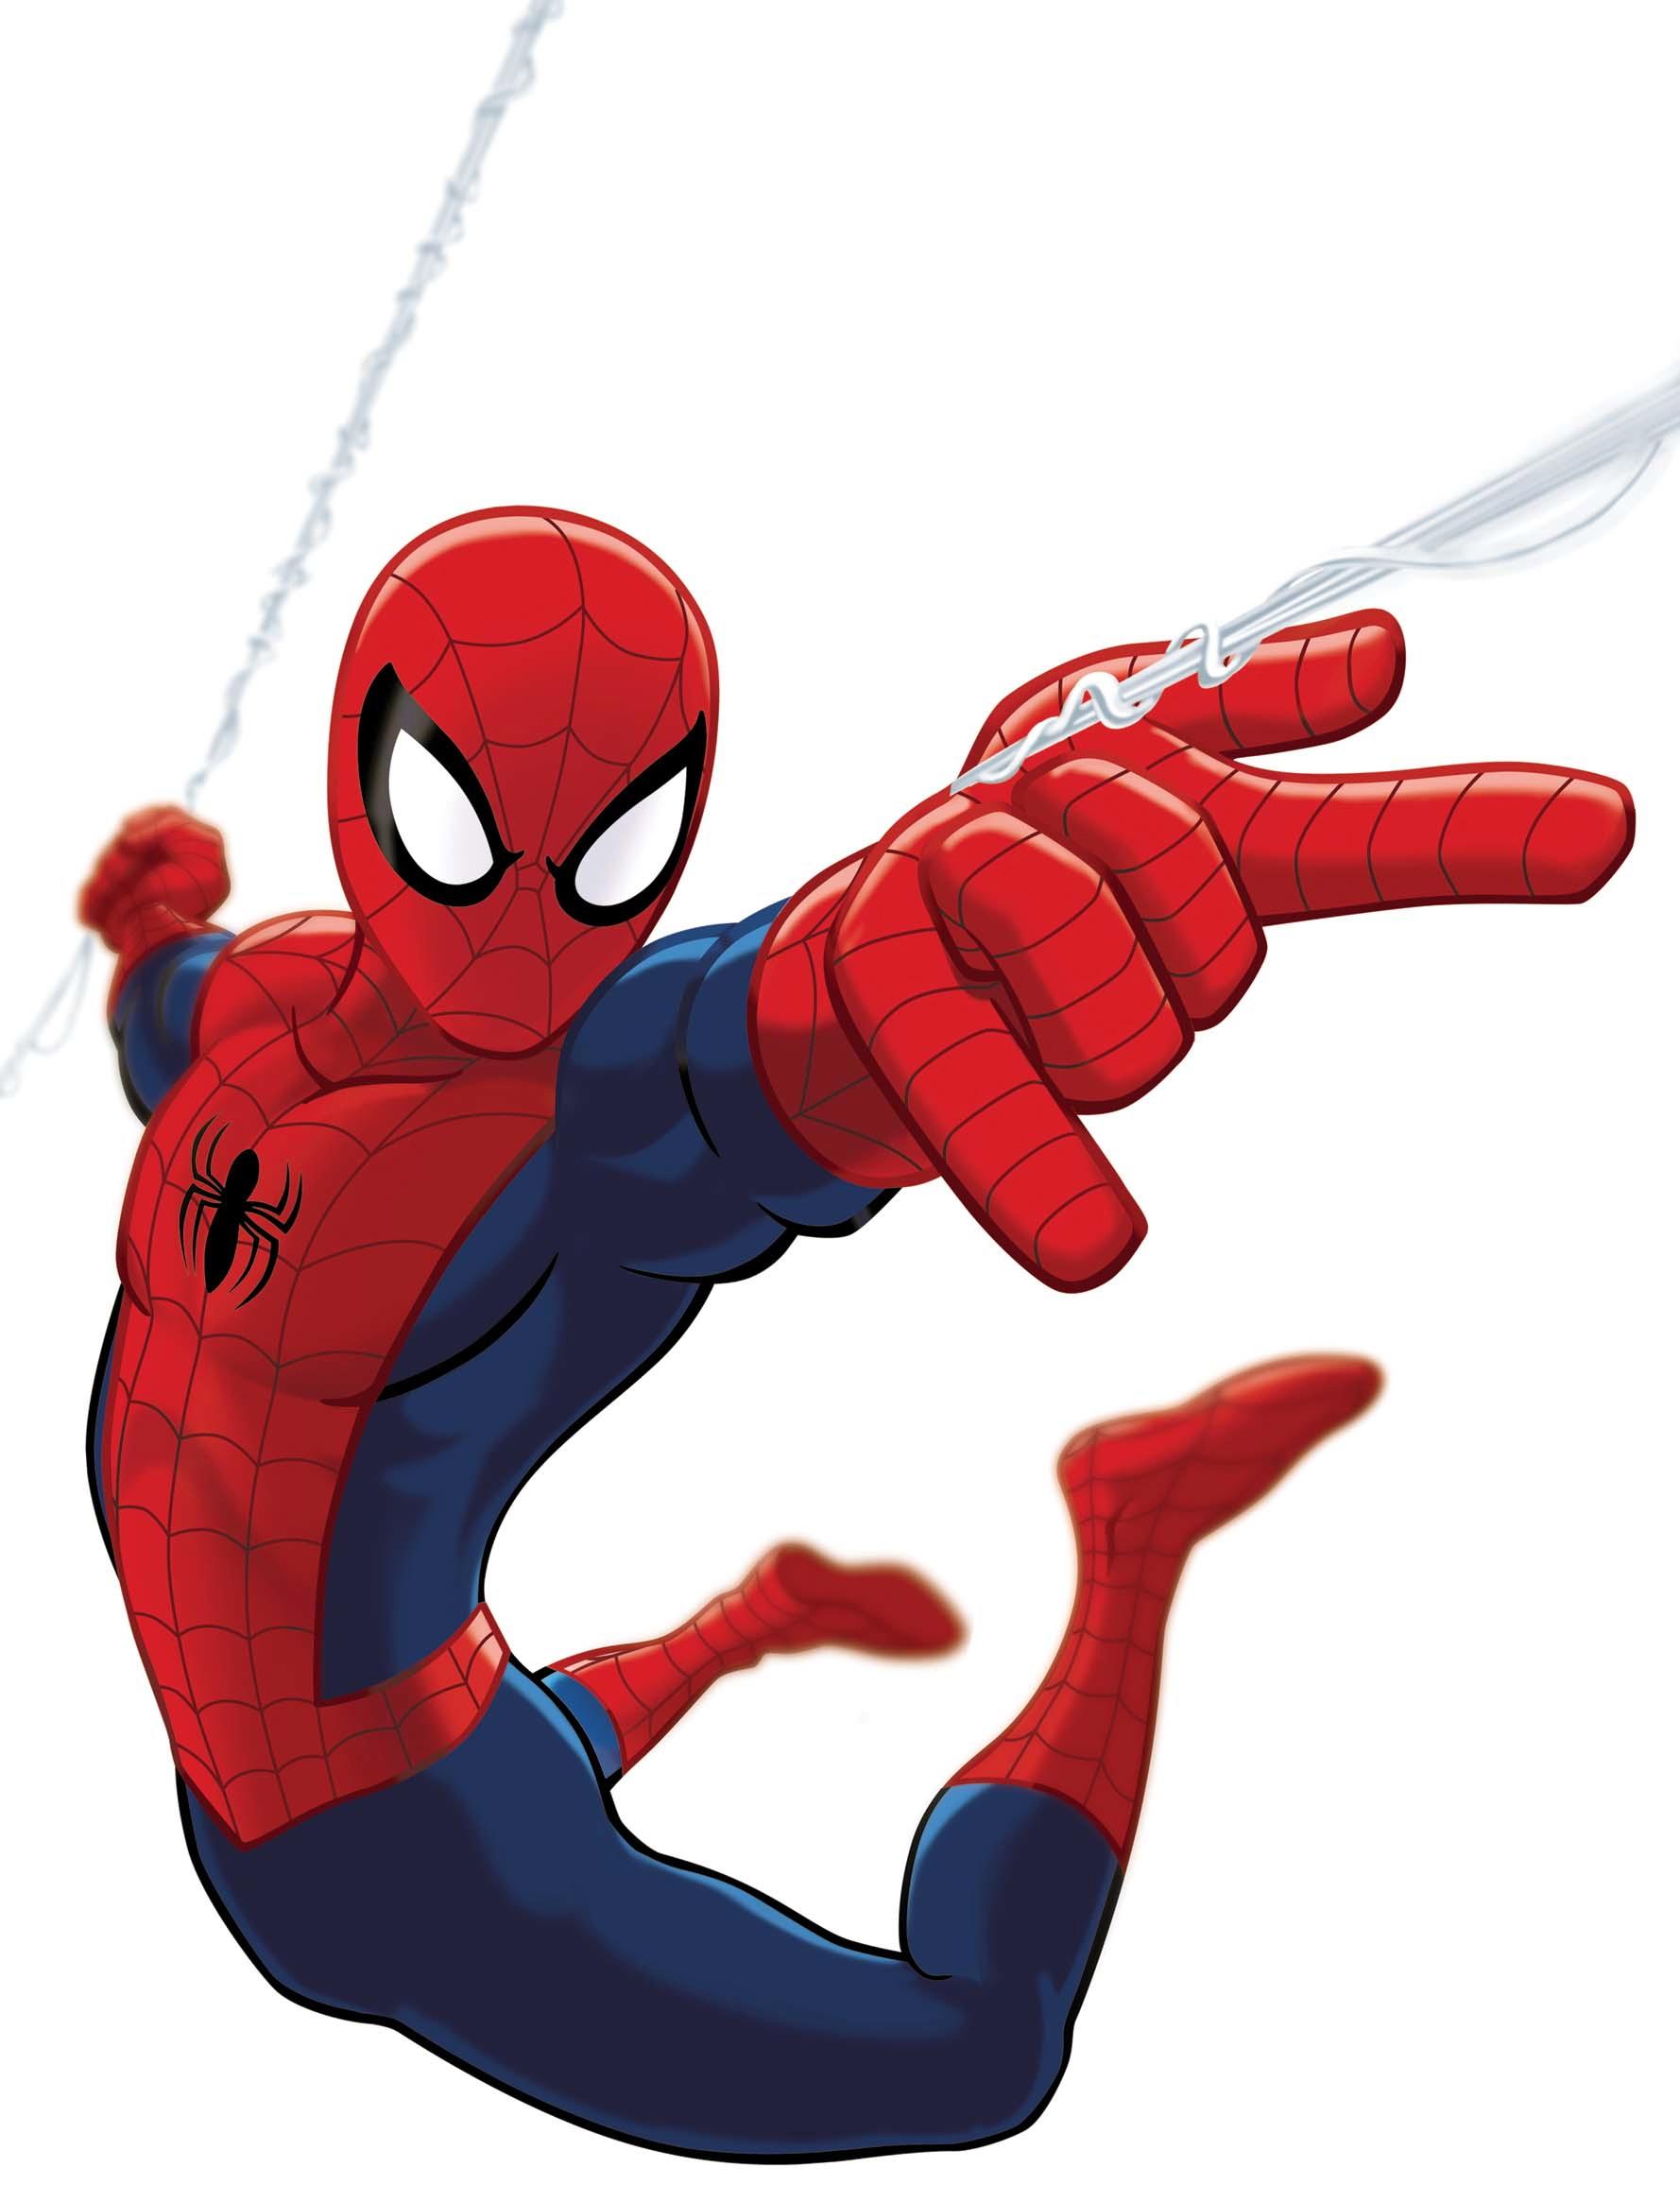 Spiderman cartoon standing - photo#22